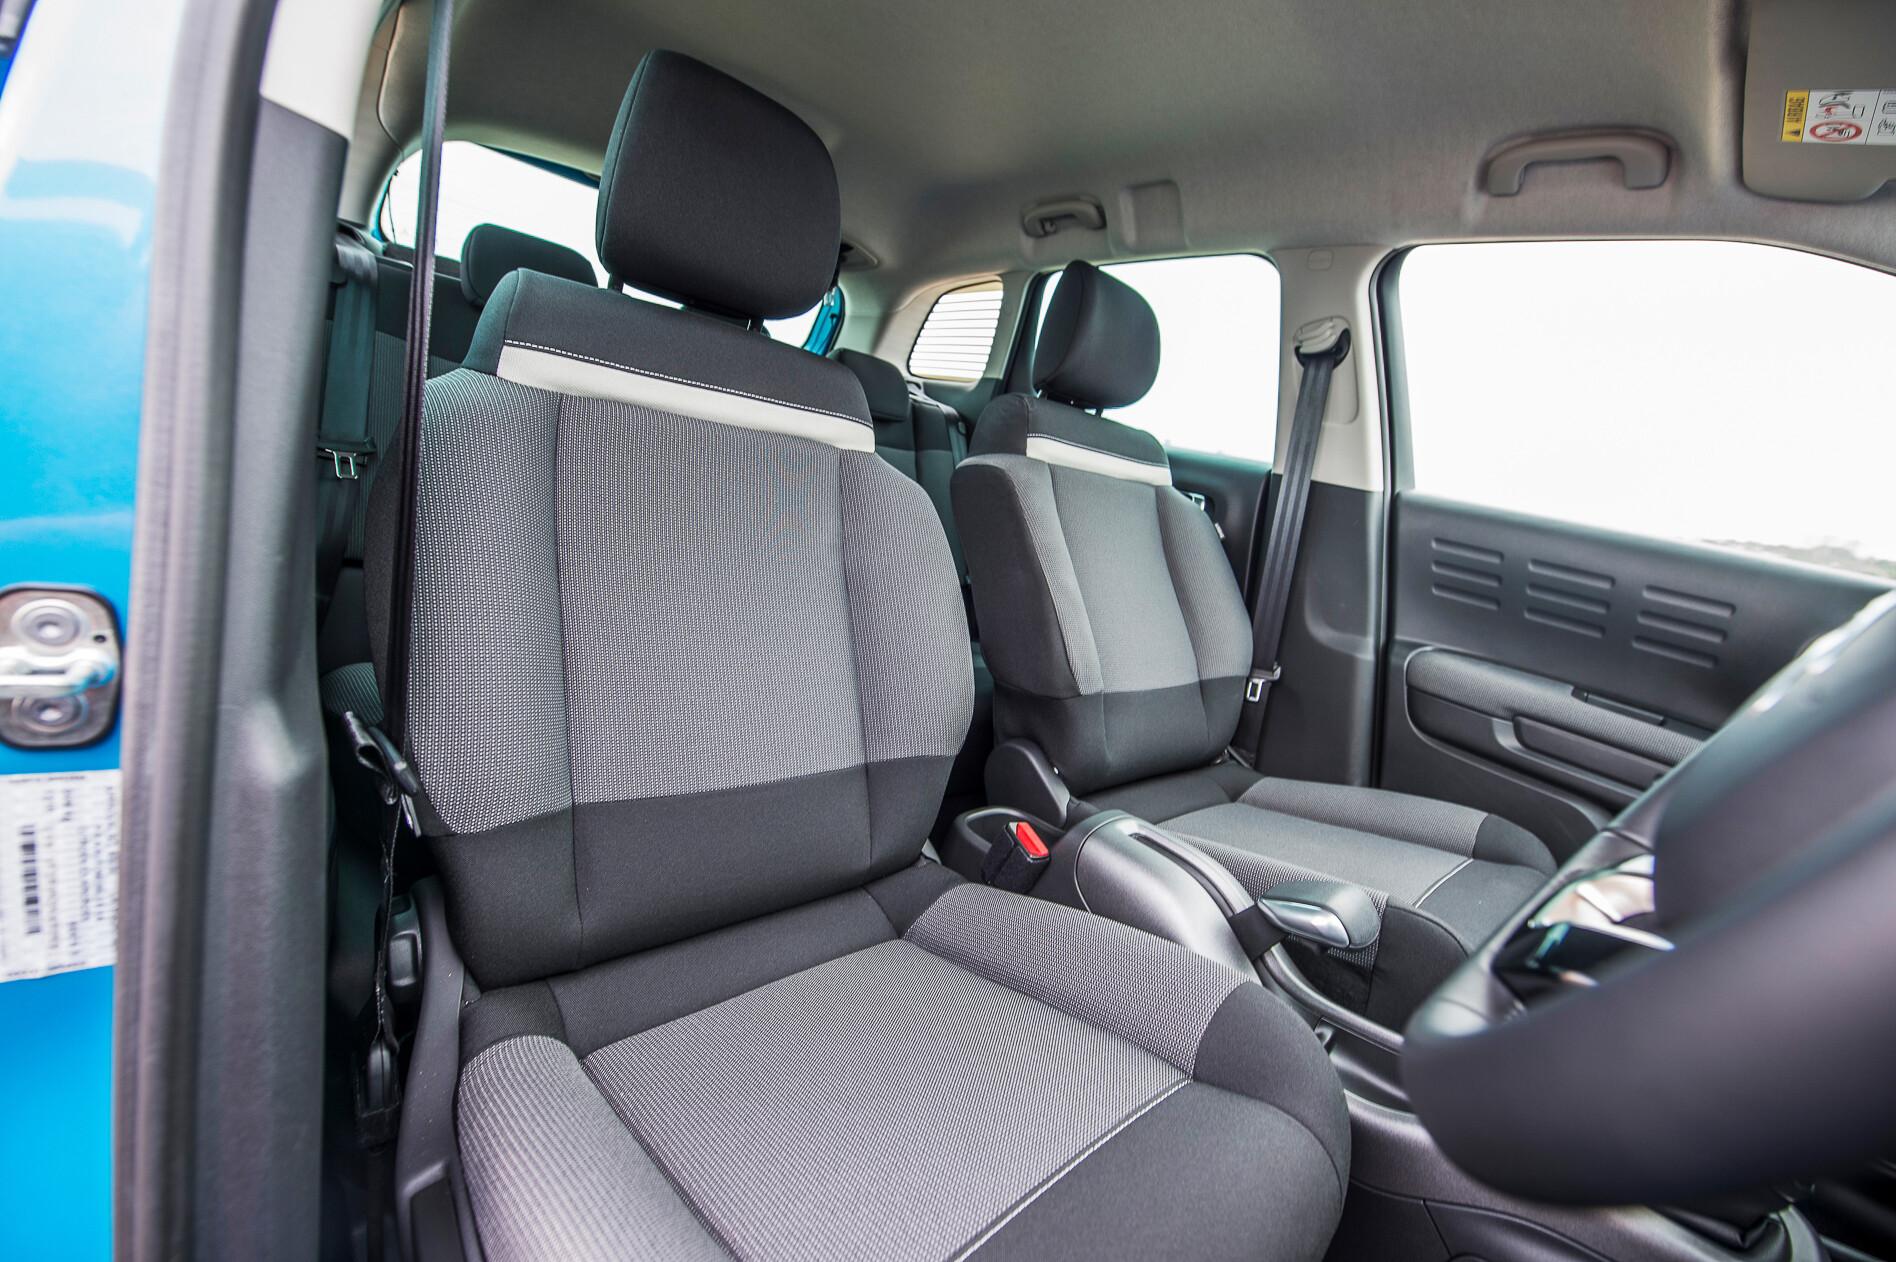 2019 Citroen C3 Aircross